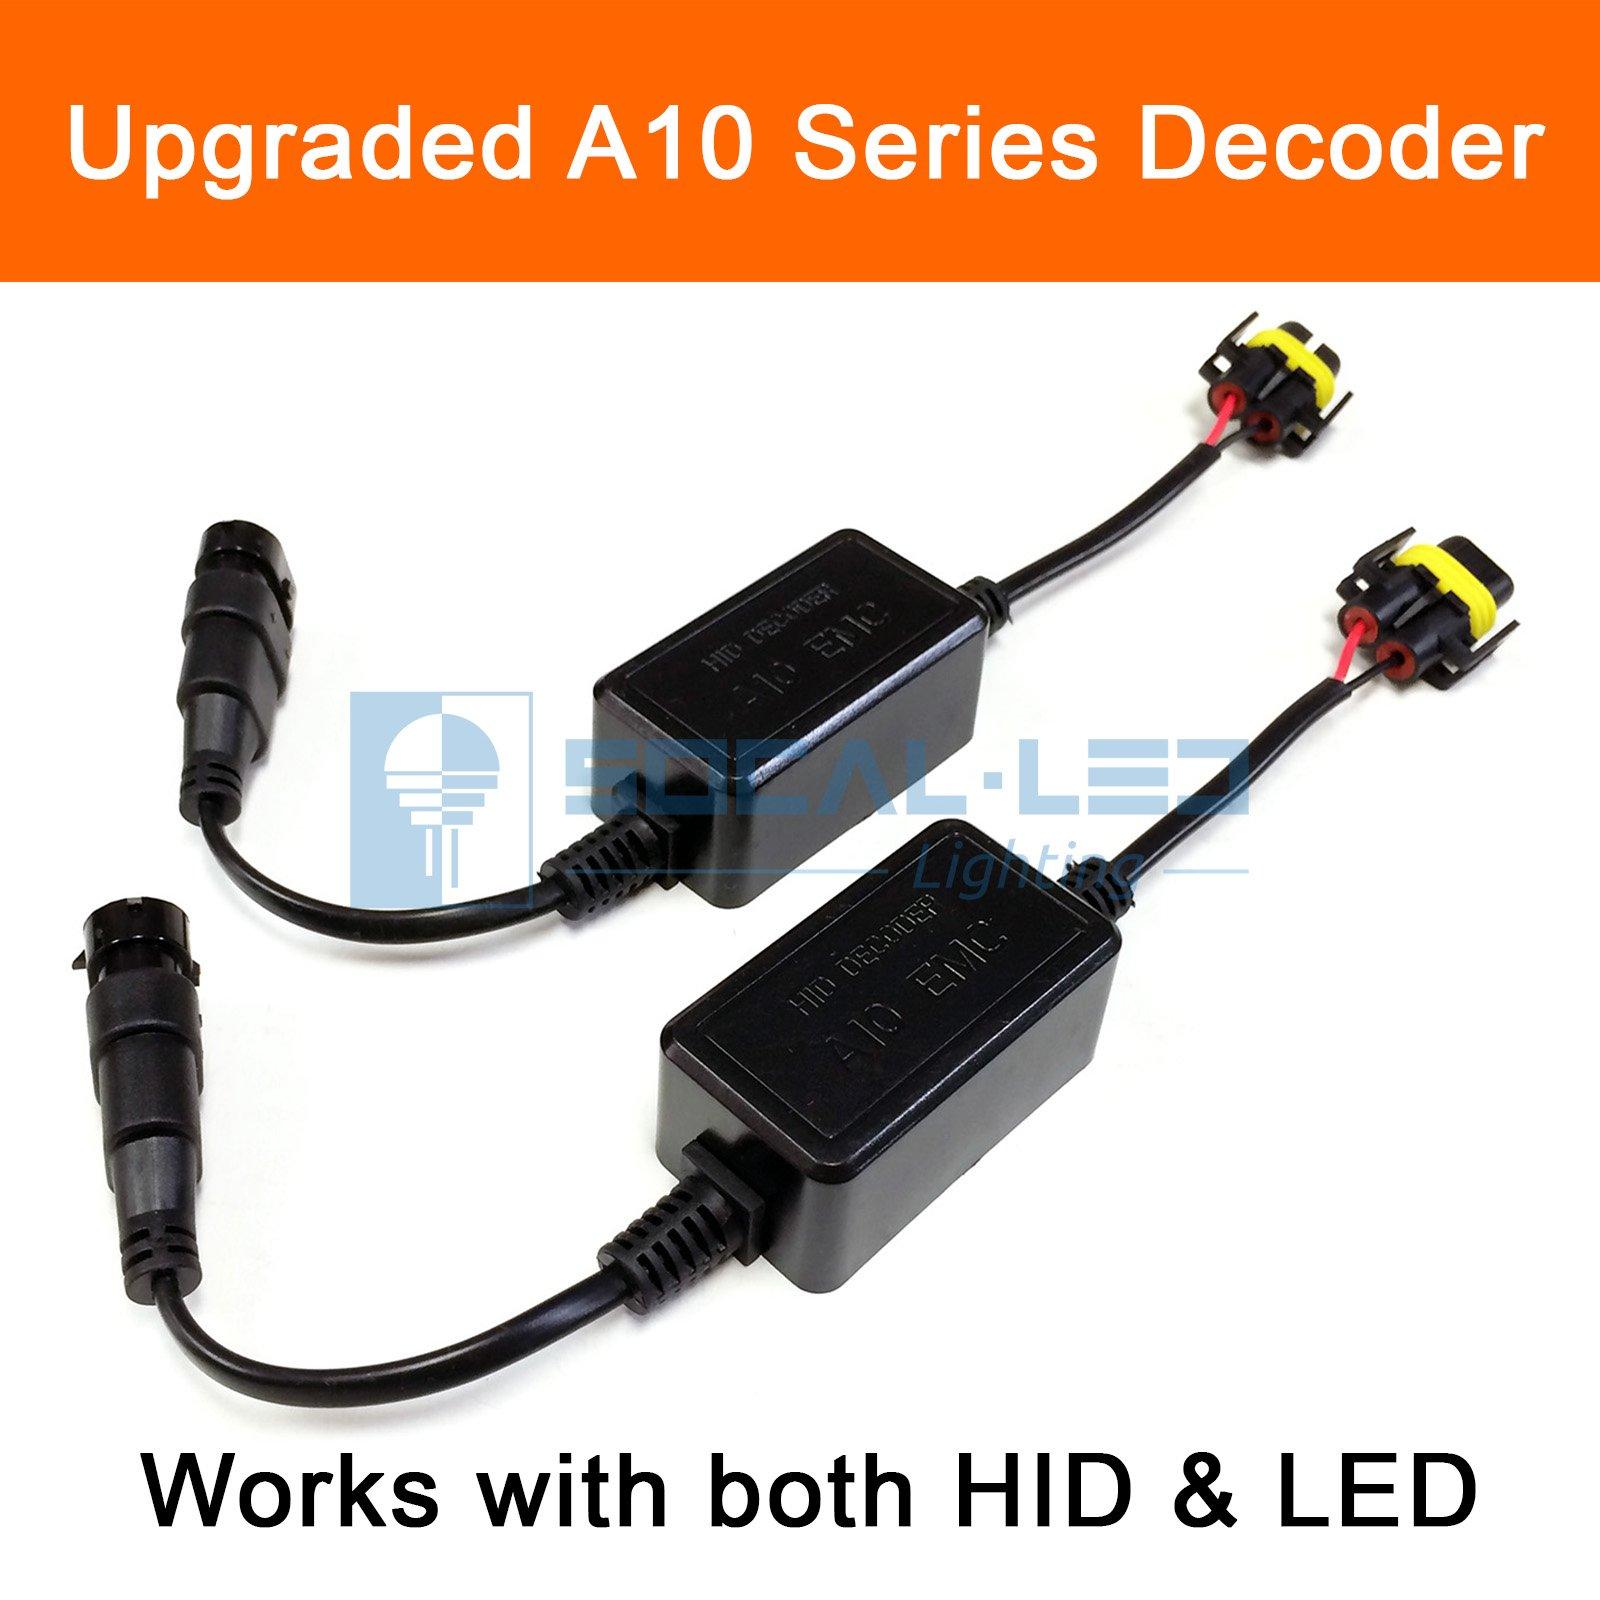 SOCAL-LED 2x A10 H11 H8 EMC Headlight Kit CANBUS HID LED Decoder Anti-Flicker Error Canceller Relay Resistor Adapter